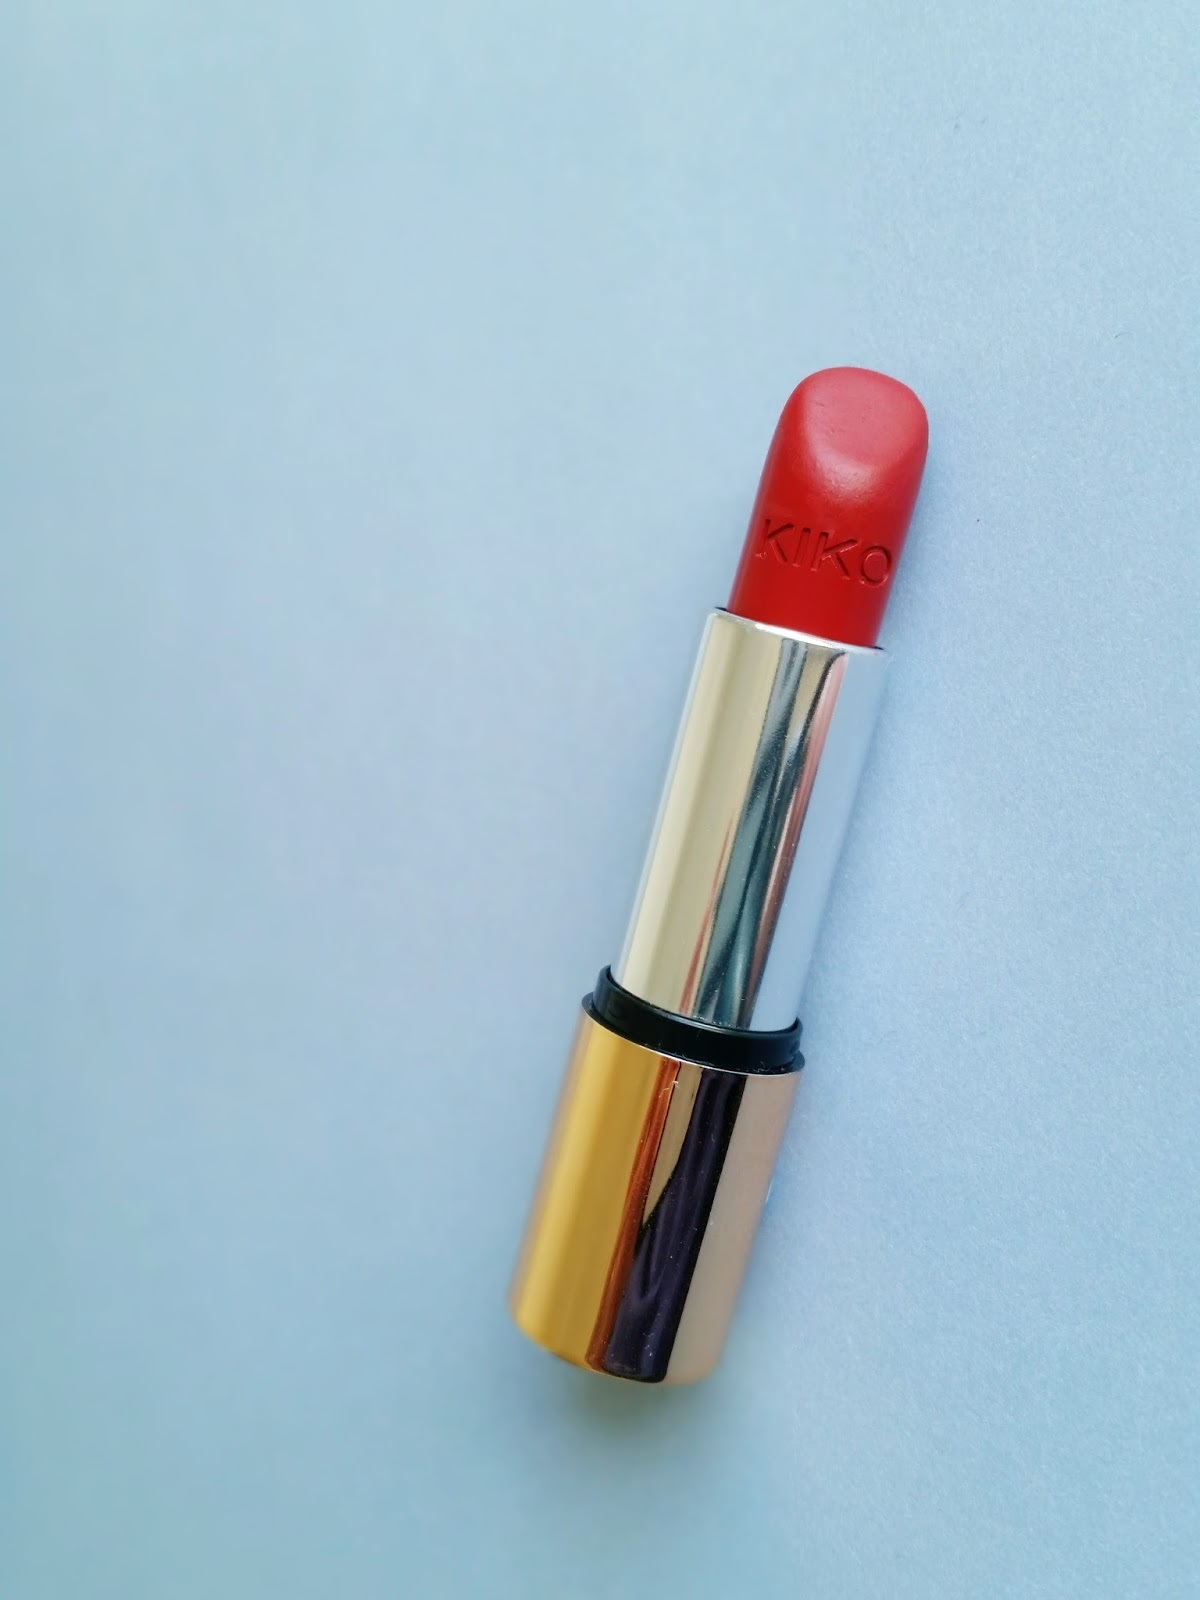 Kiko VELVET MAT SATIN LIPSTICK in apple red